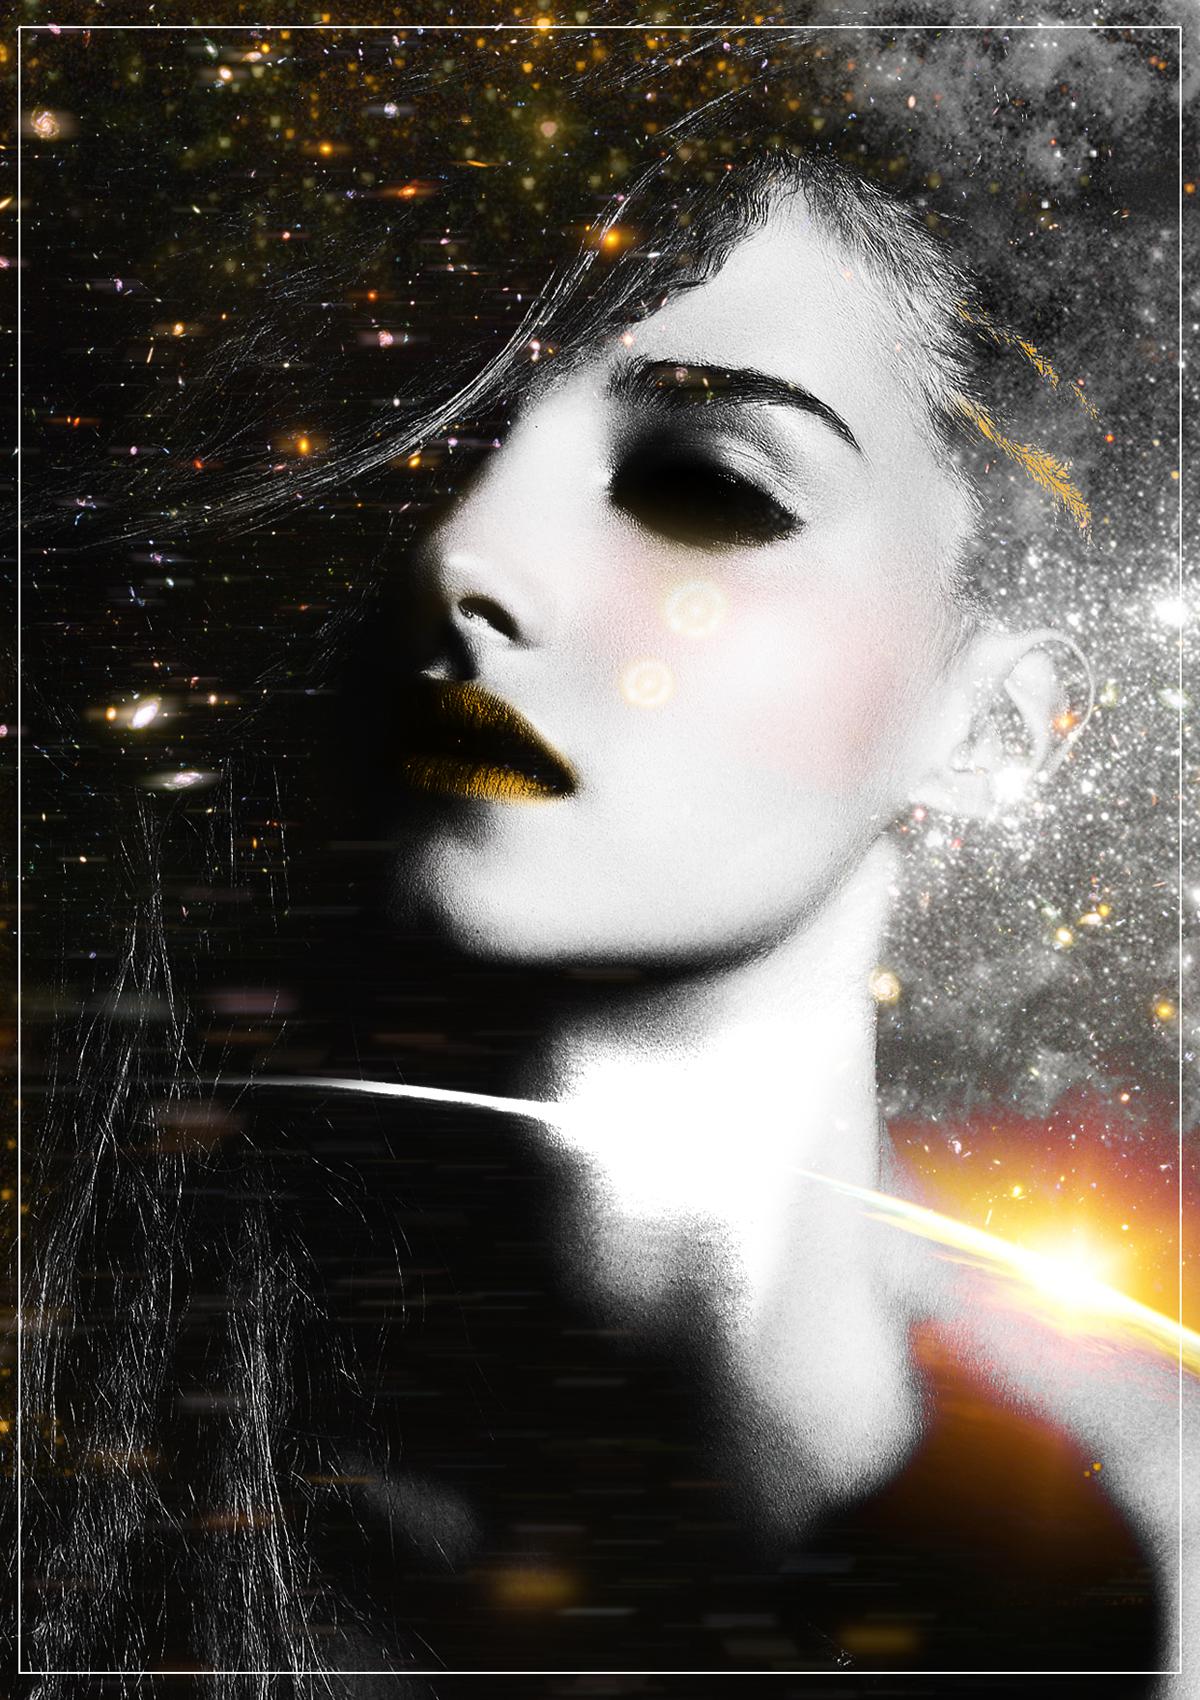 Cosmic Love - Eclipse